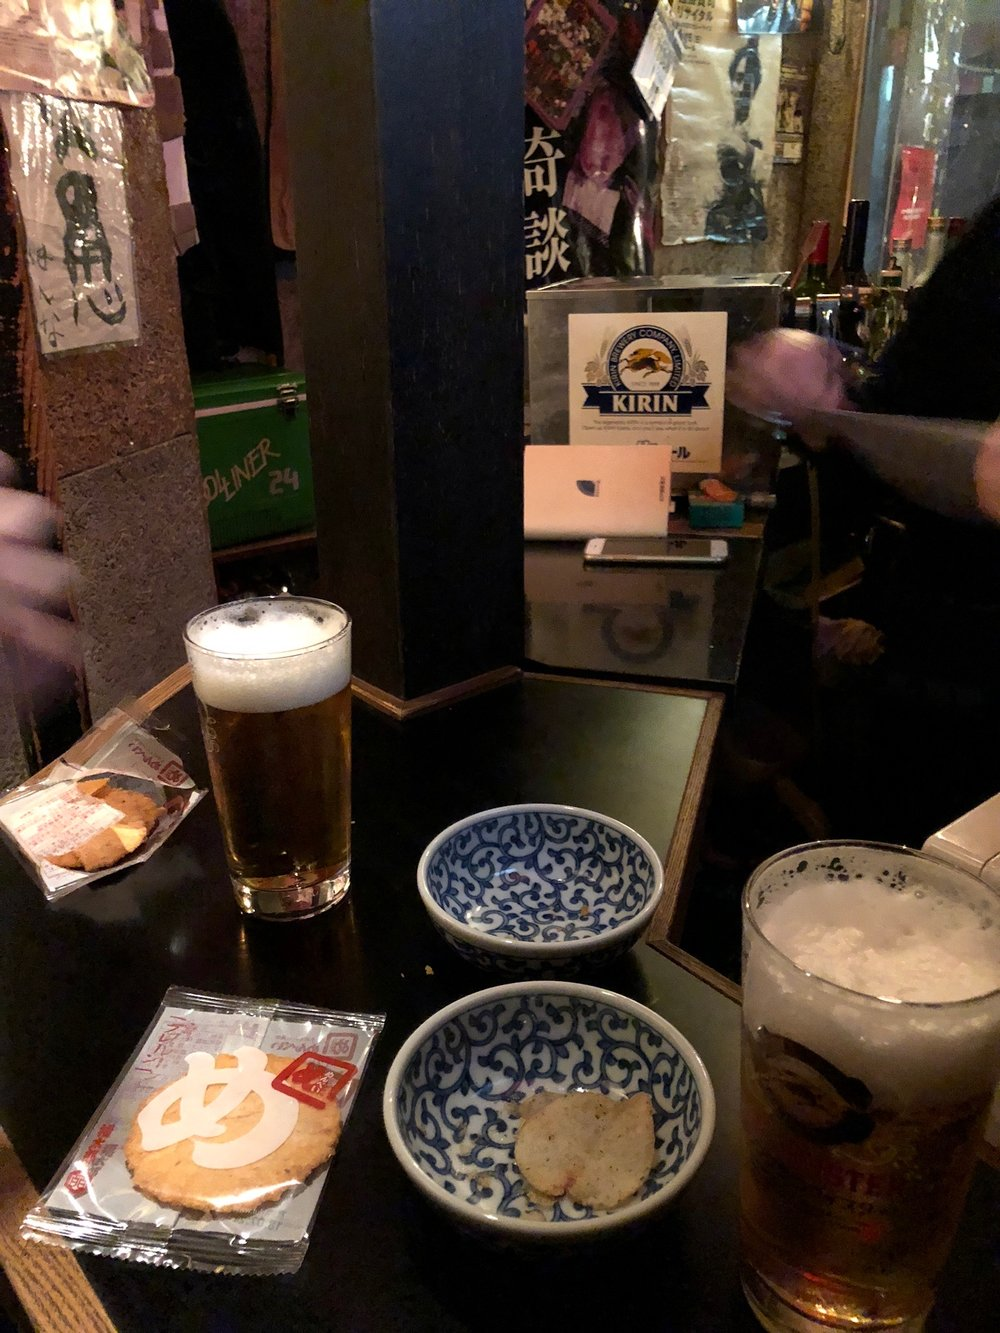 Inside the Pink Floyd bar in Golden Gai.